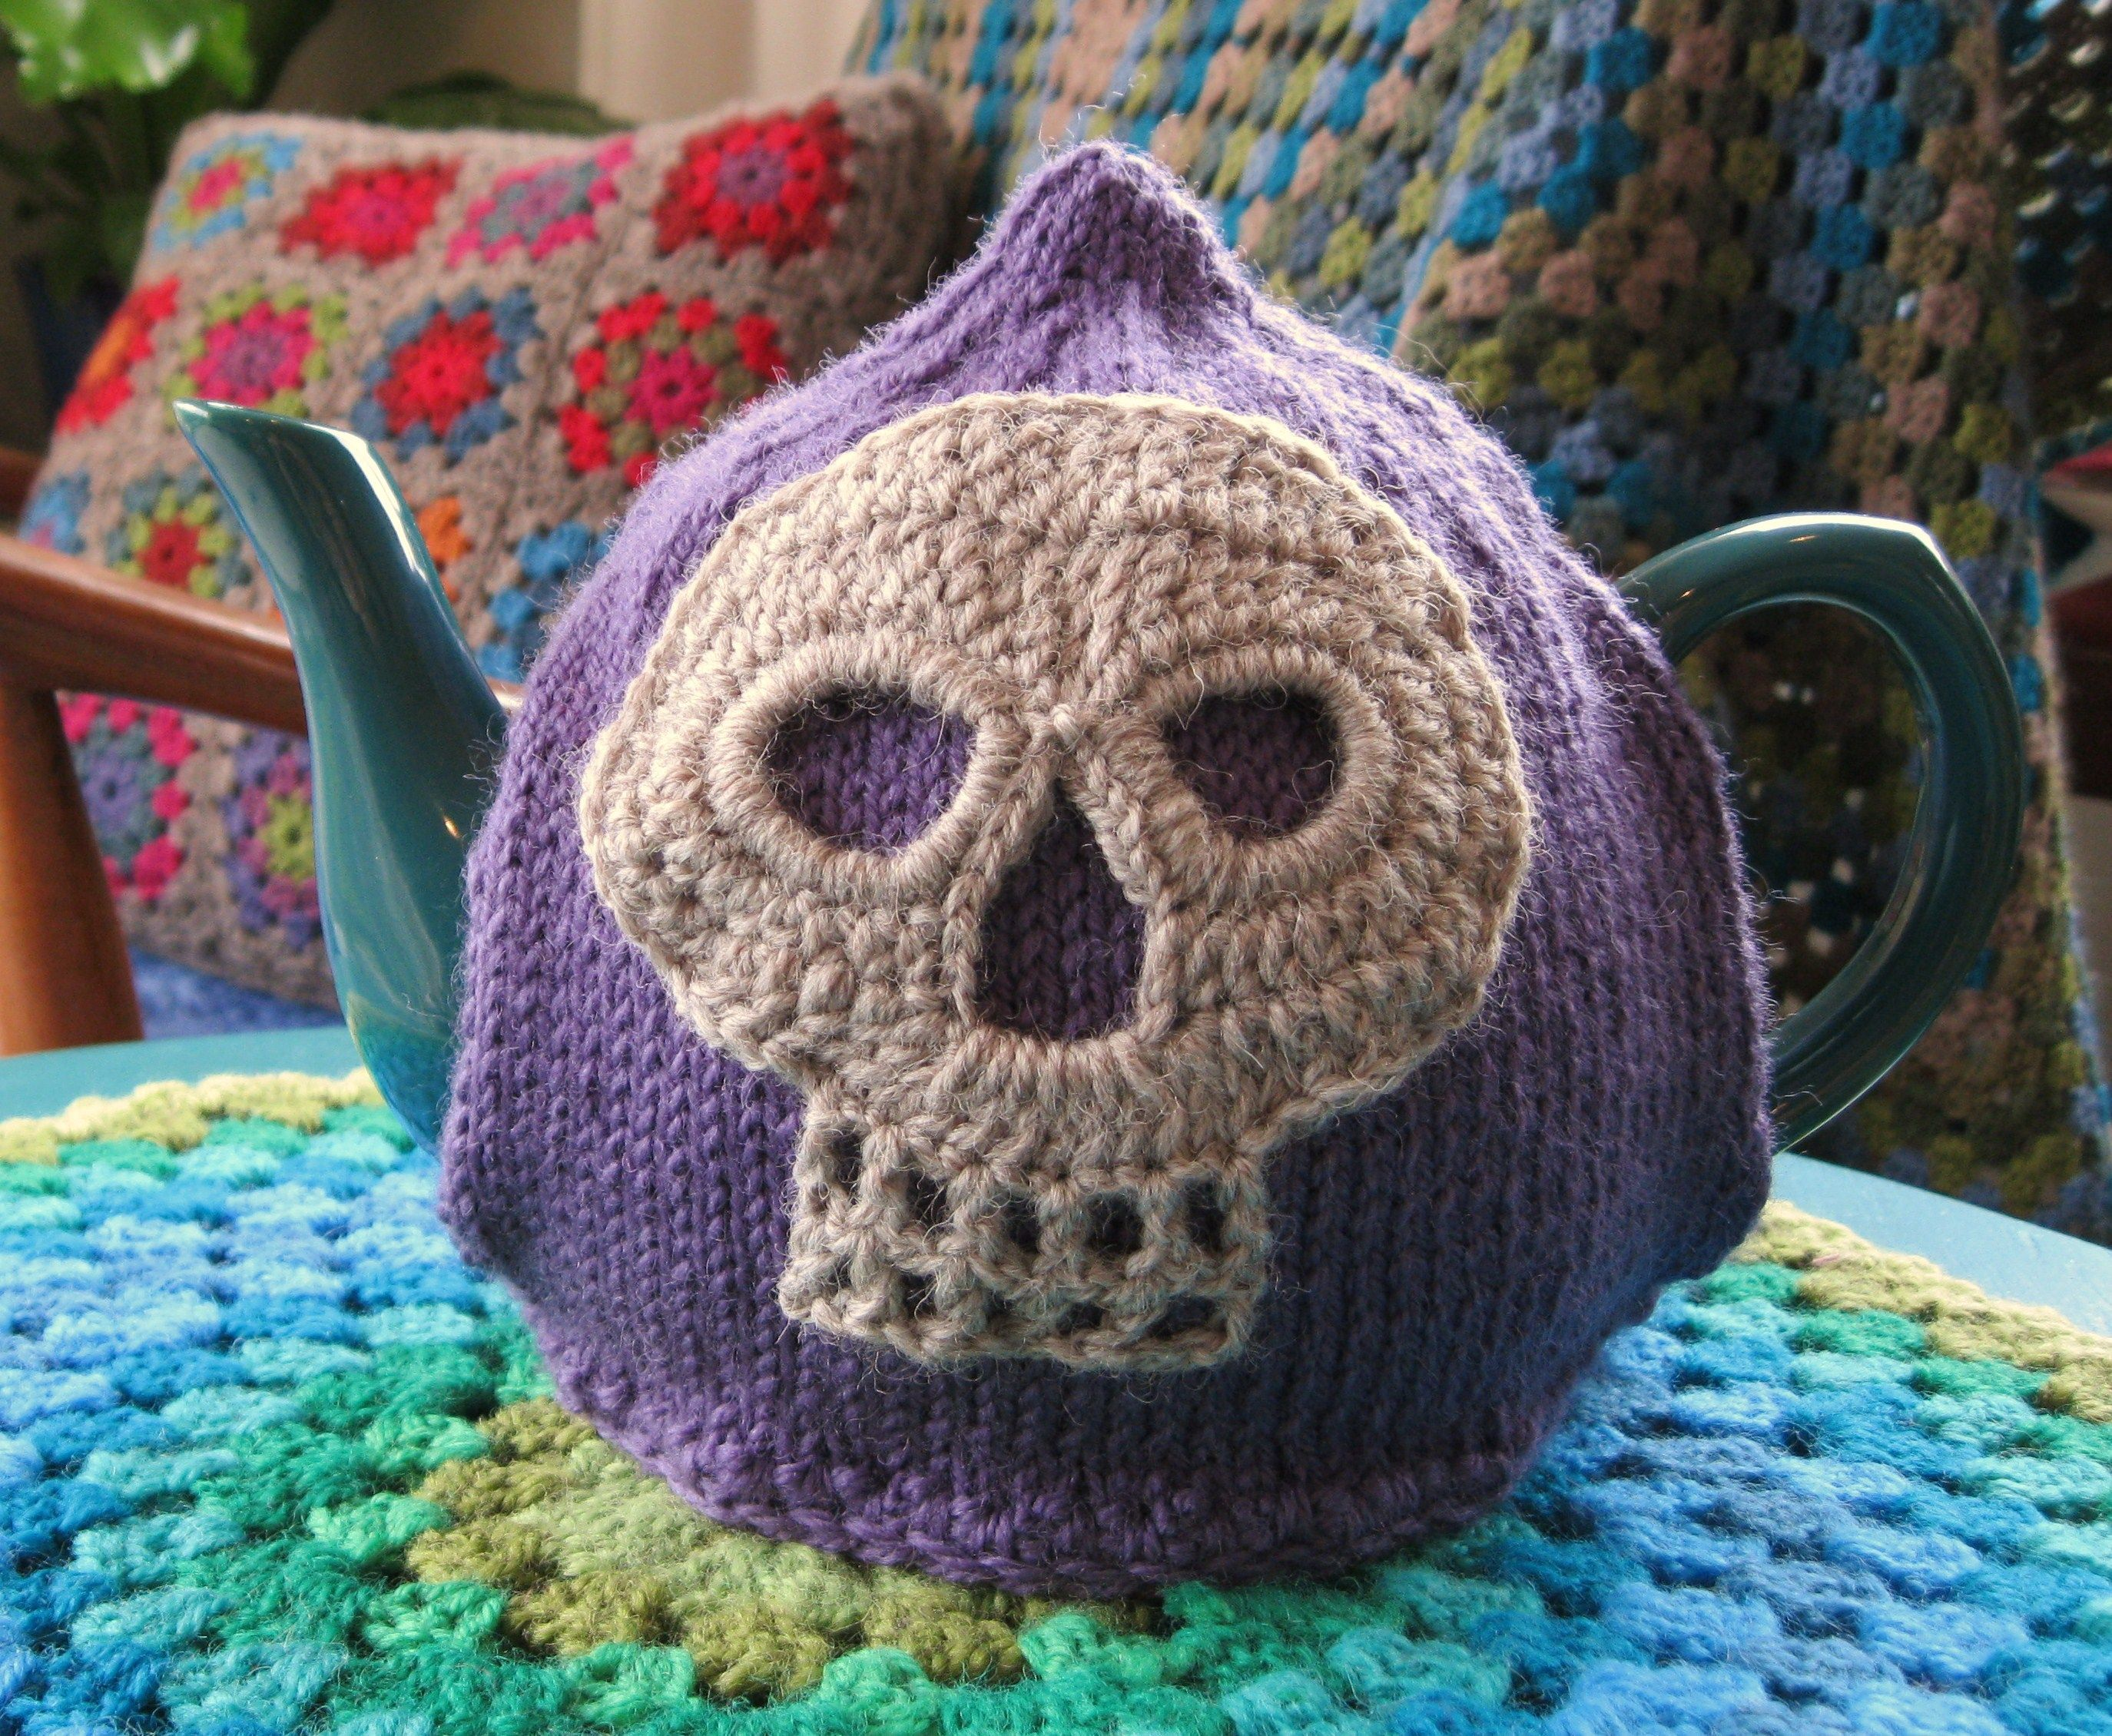 DIY Skull Tea Cozy   Things I will try to make   Pinterest   Tea ...